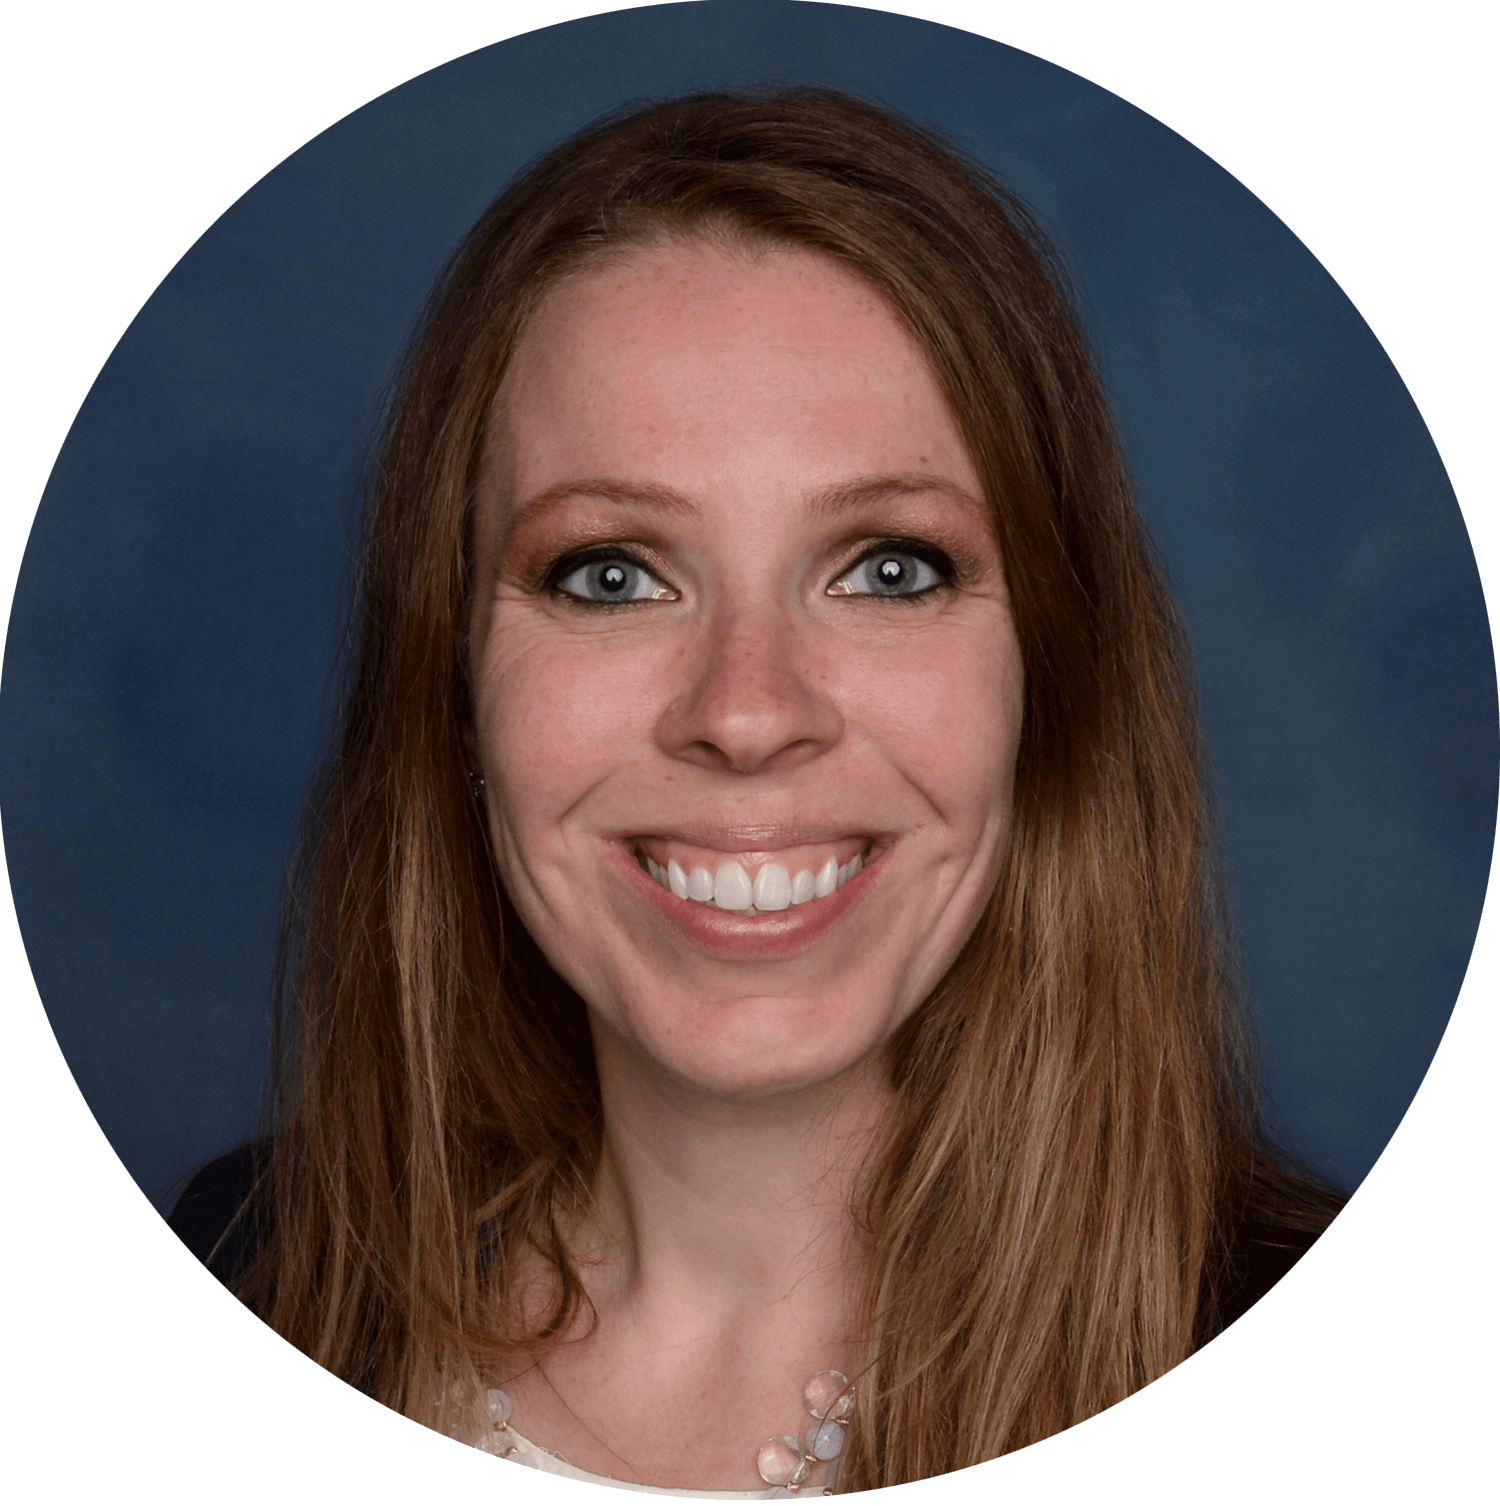 Sara Schoen smiling for formal headshot